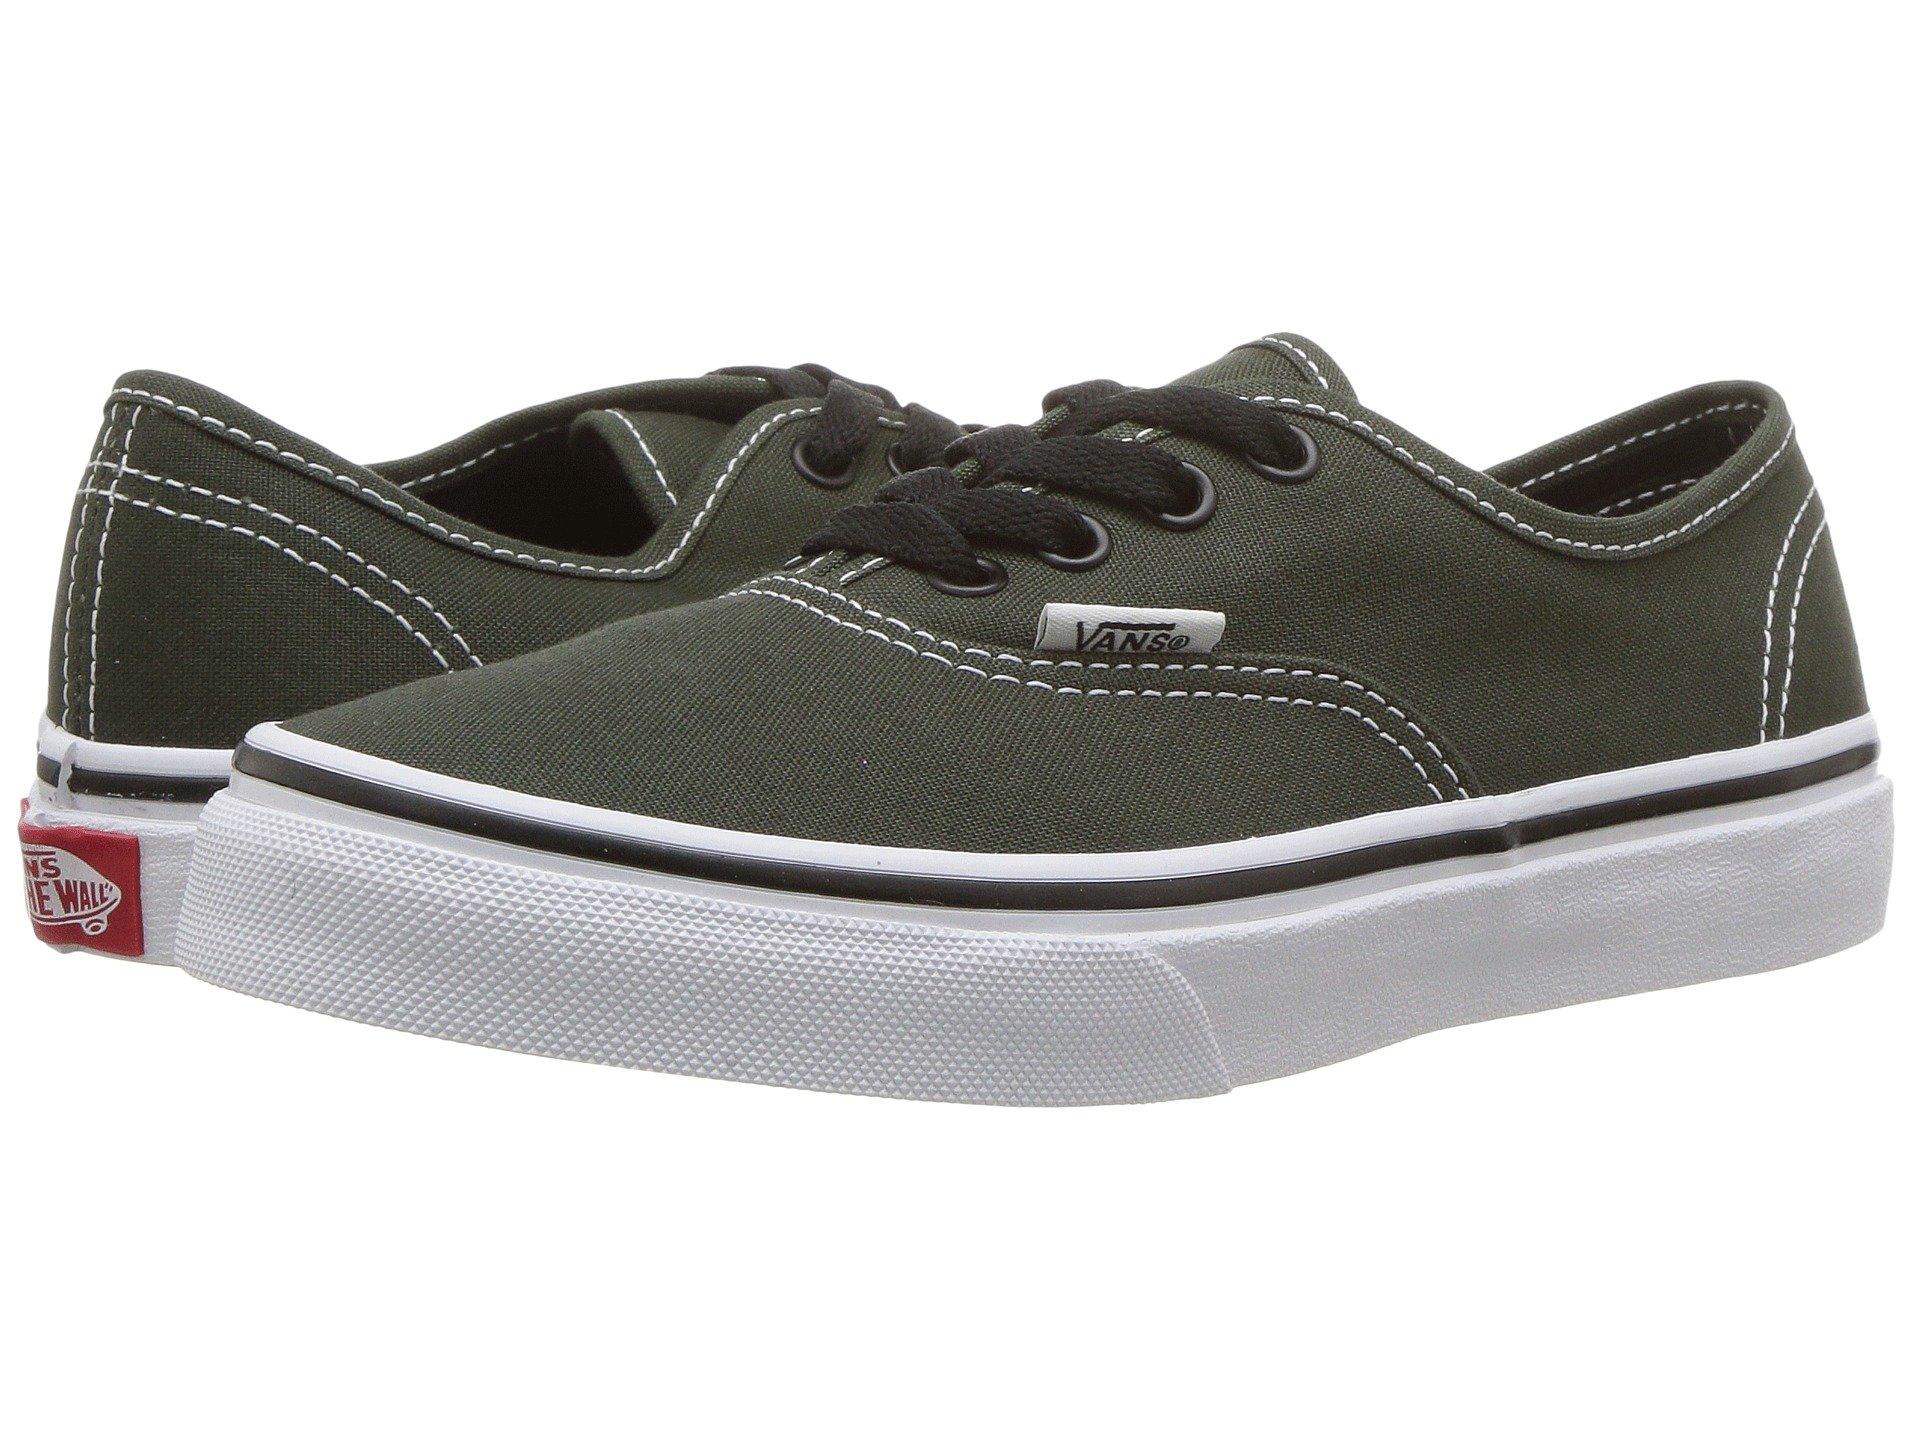 vans shoes for kids boys